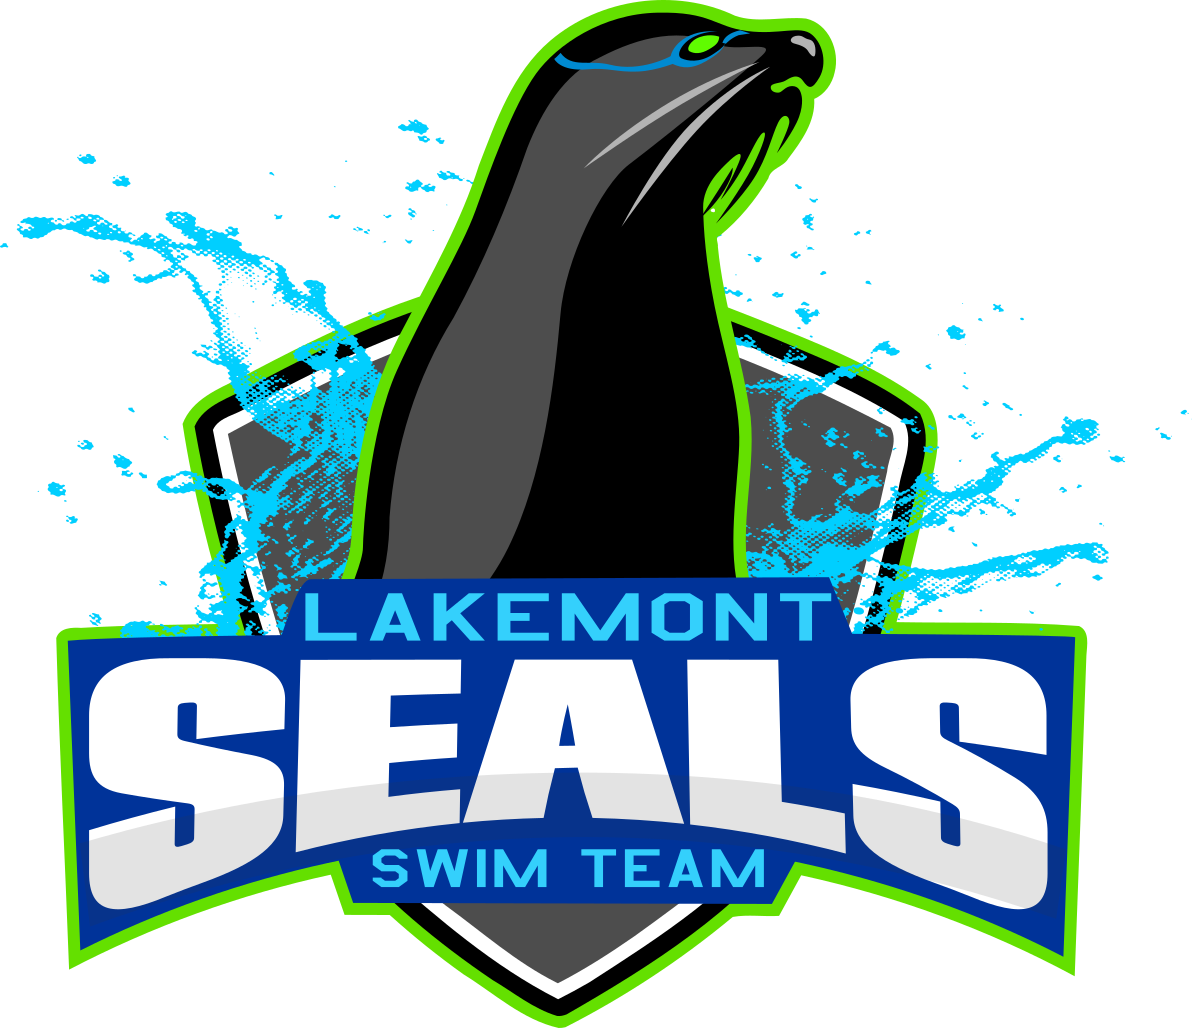 home lakemont seals swim team